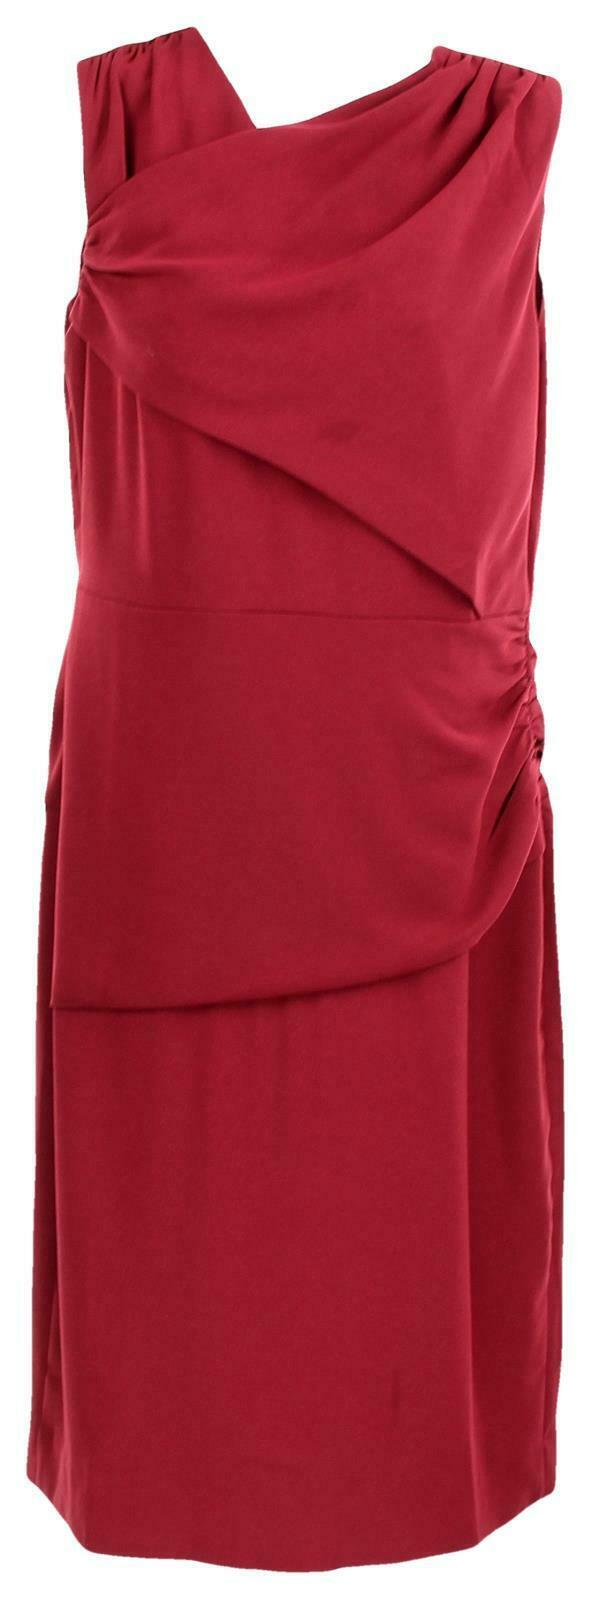 J Crew Women's High Neck Sheath Dress Everyday Lucky Crepe Wear to Work 8 J7452